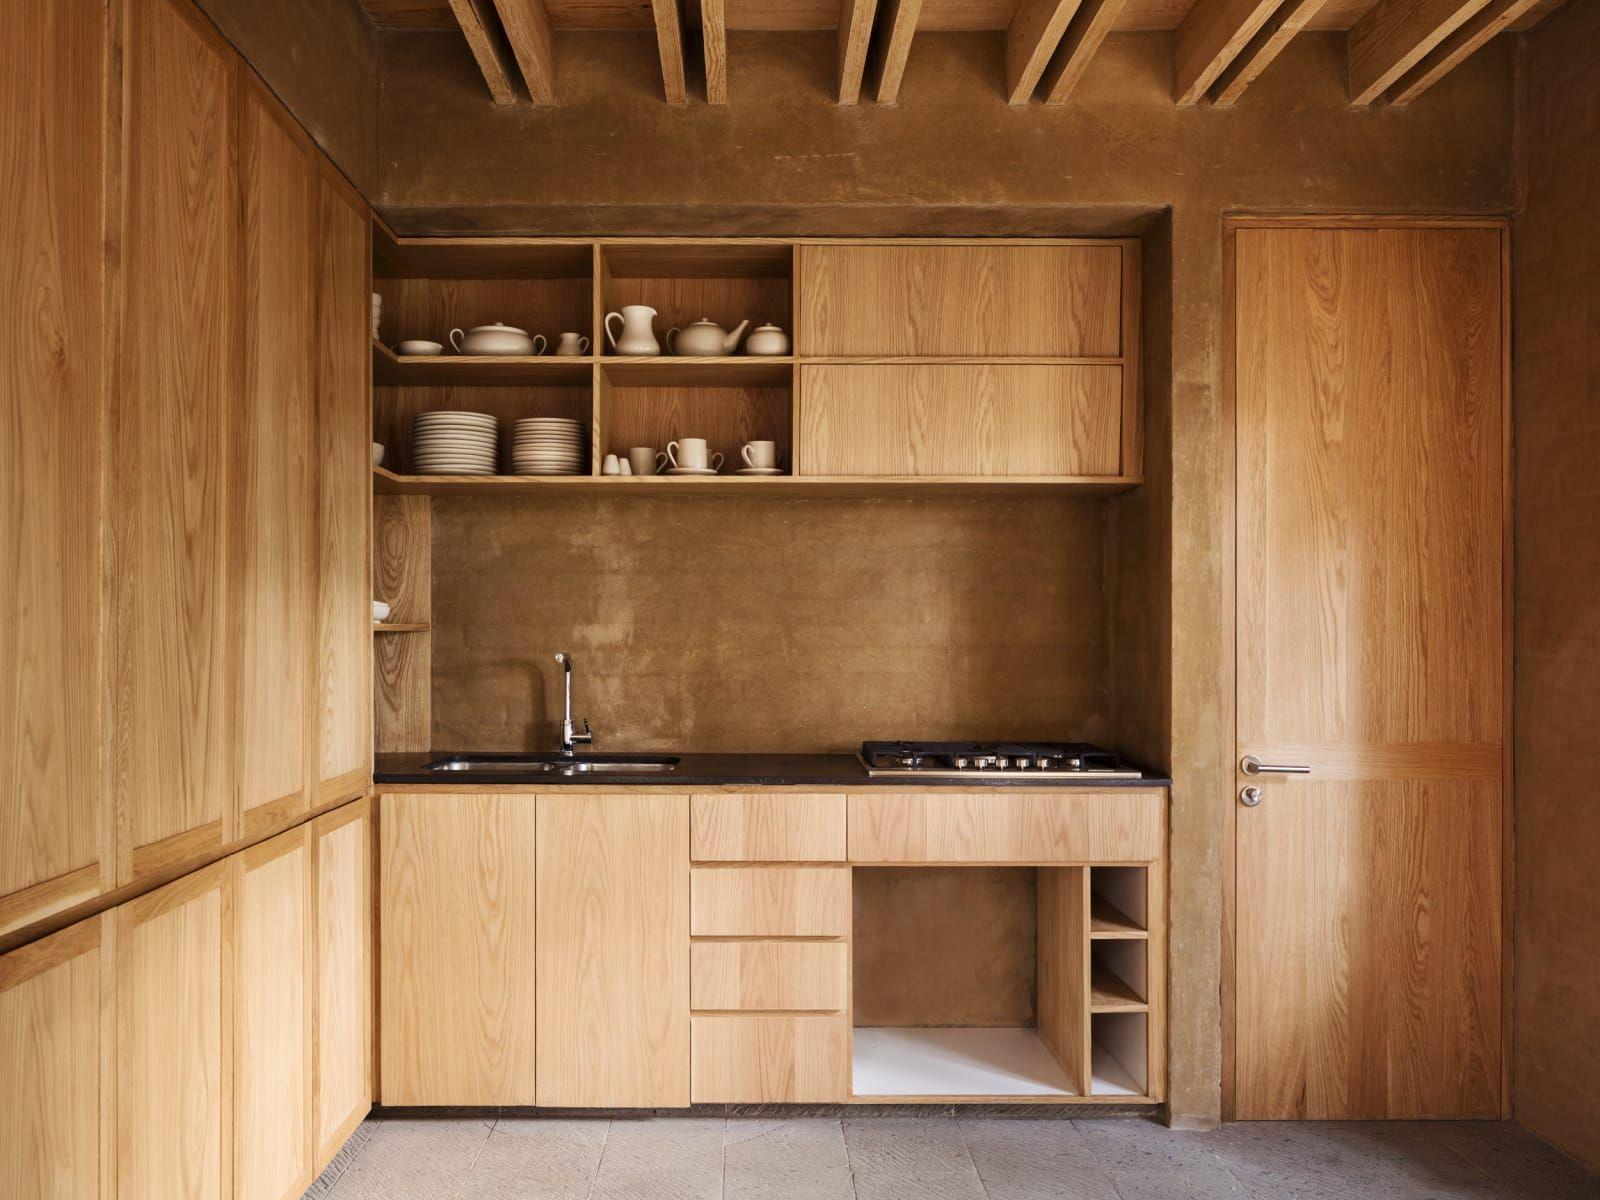 Pin De Cati Rotger En Cocinas Modernas Pinterest Pino Taller  # Muebles Saez Las Tablas